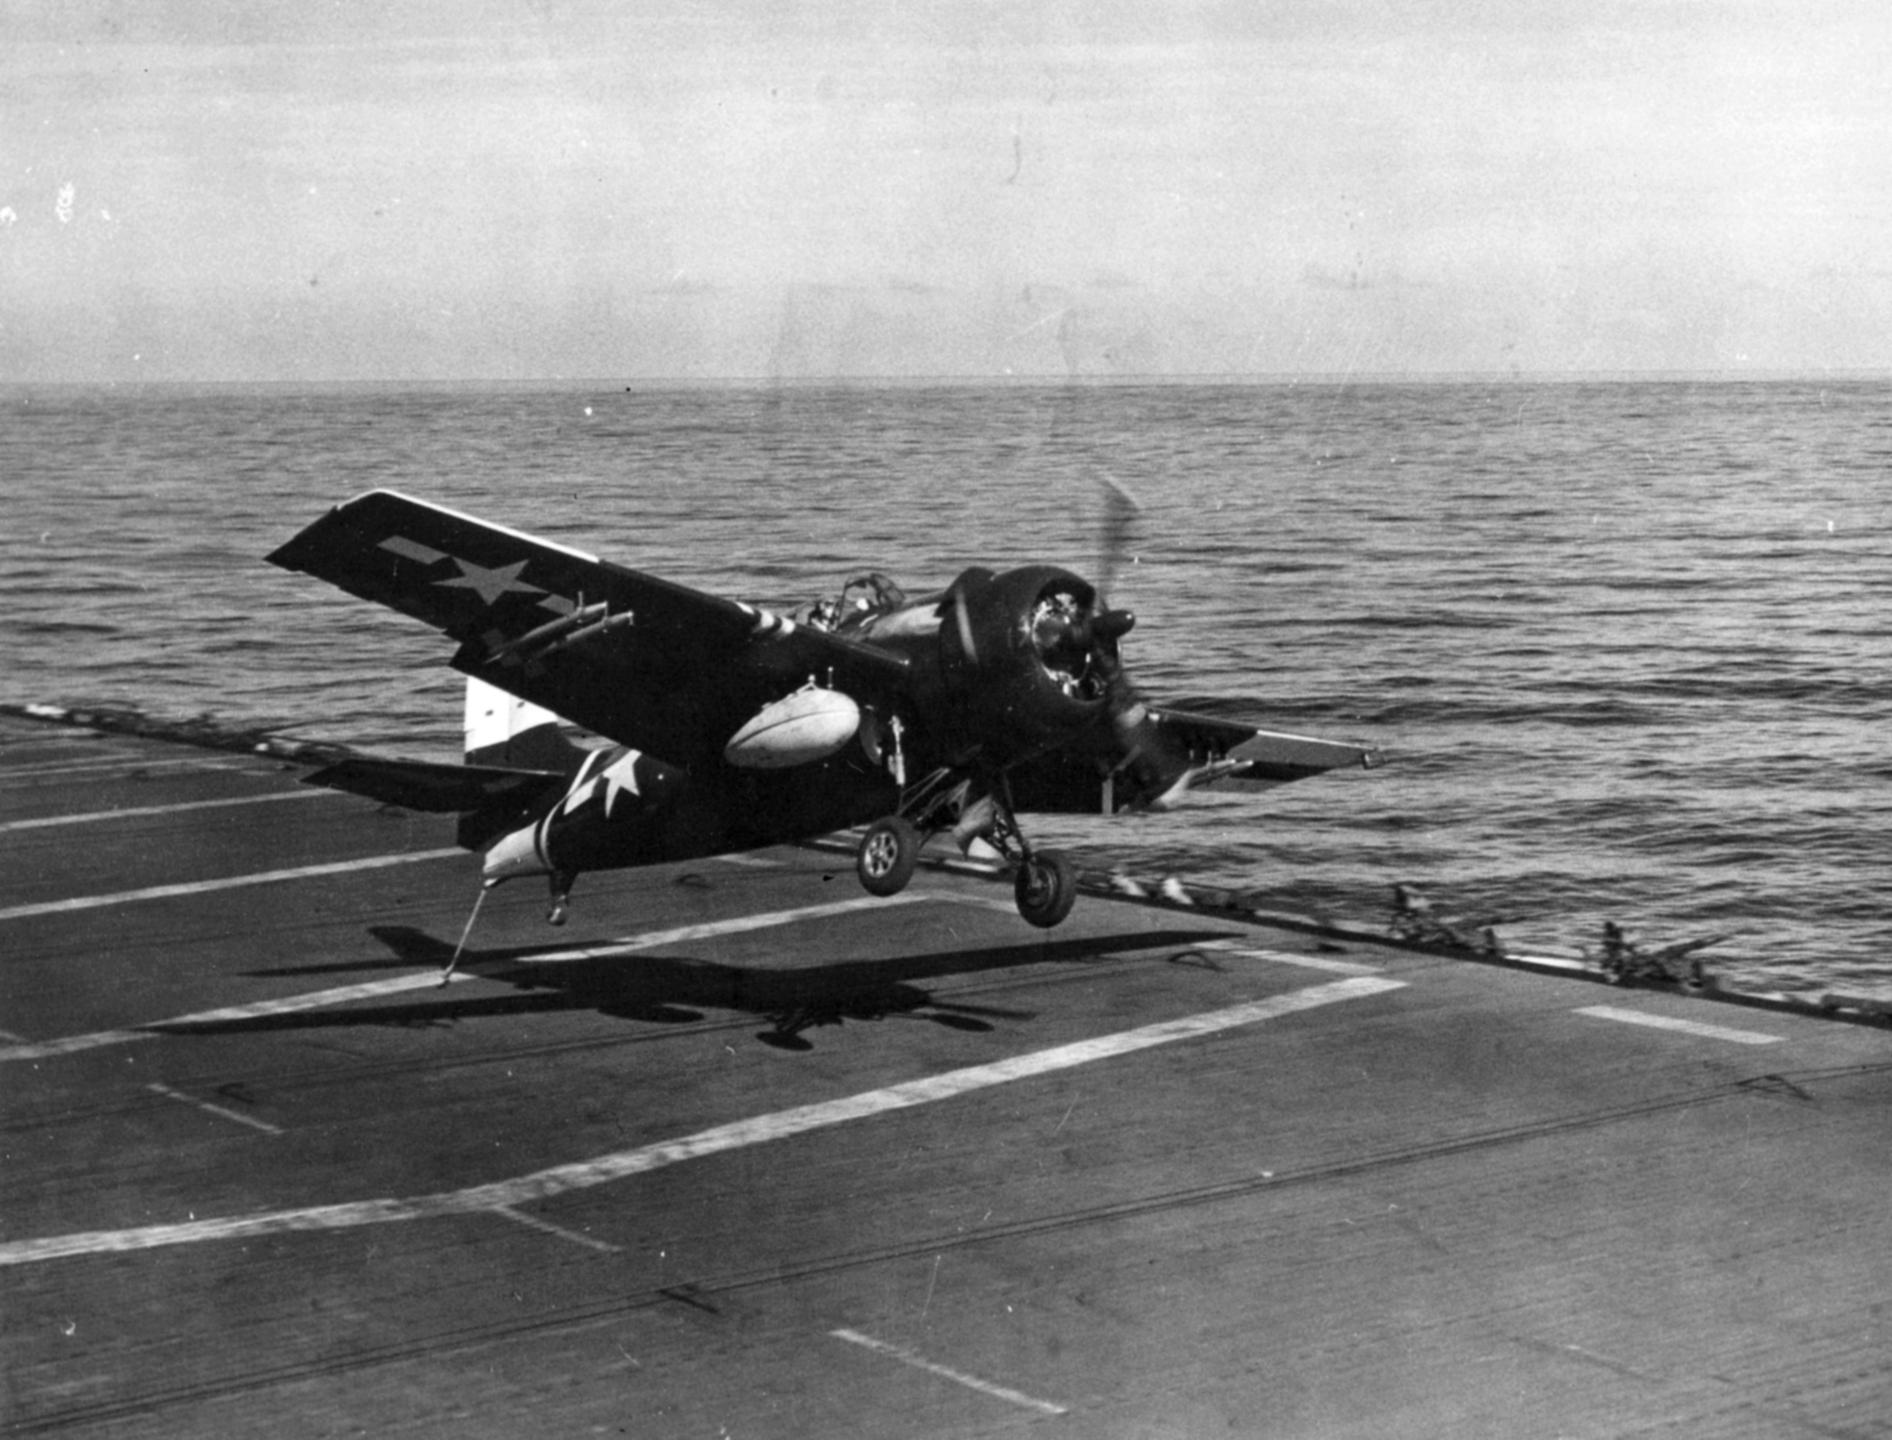 FM 2 Wildcat VC 70 trying to land CVE 96 USS Salamaua 1945 01